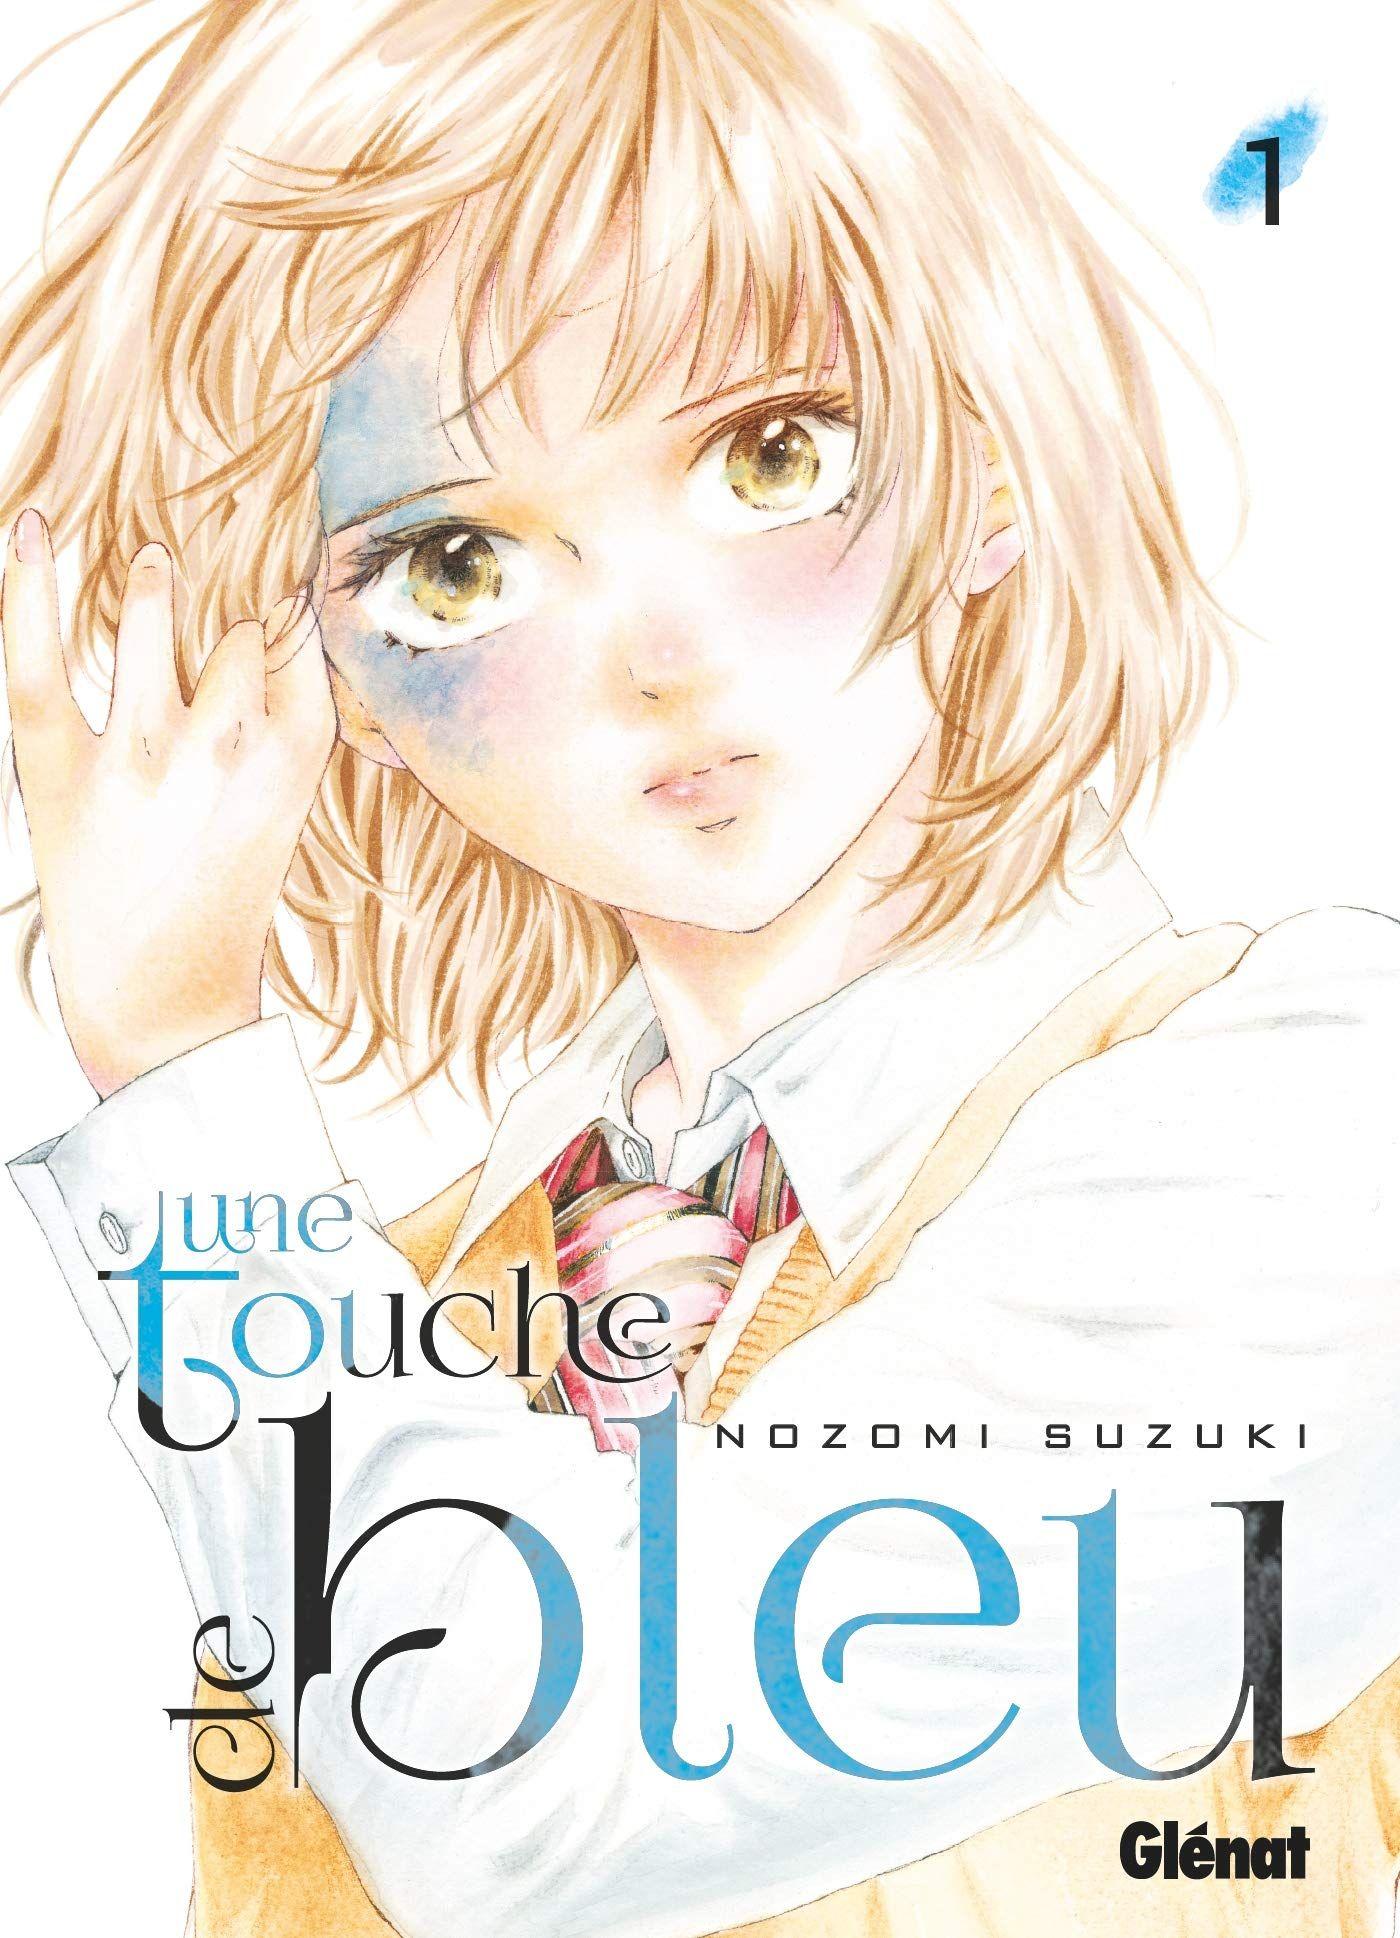 Touche de bleu (une) - Manga série - Manga news